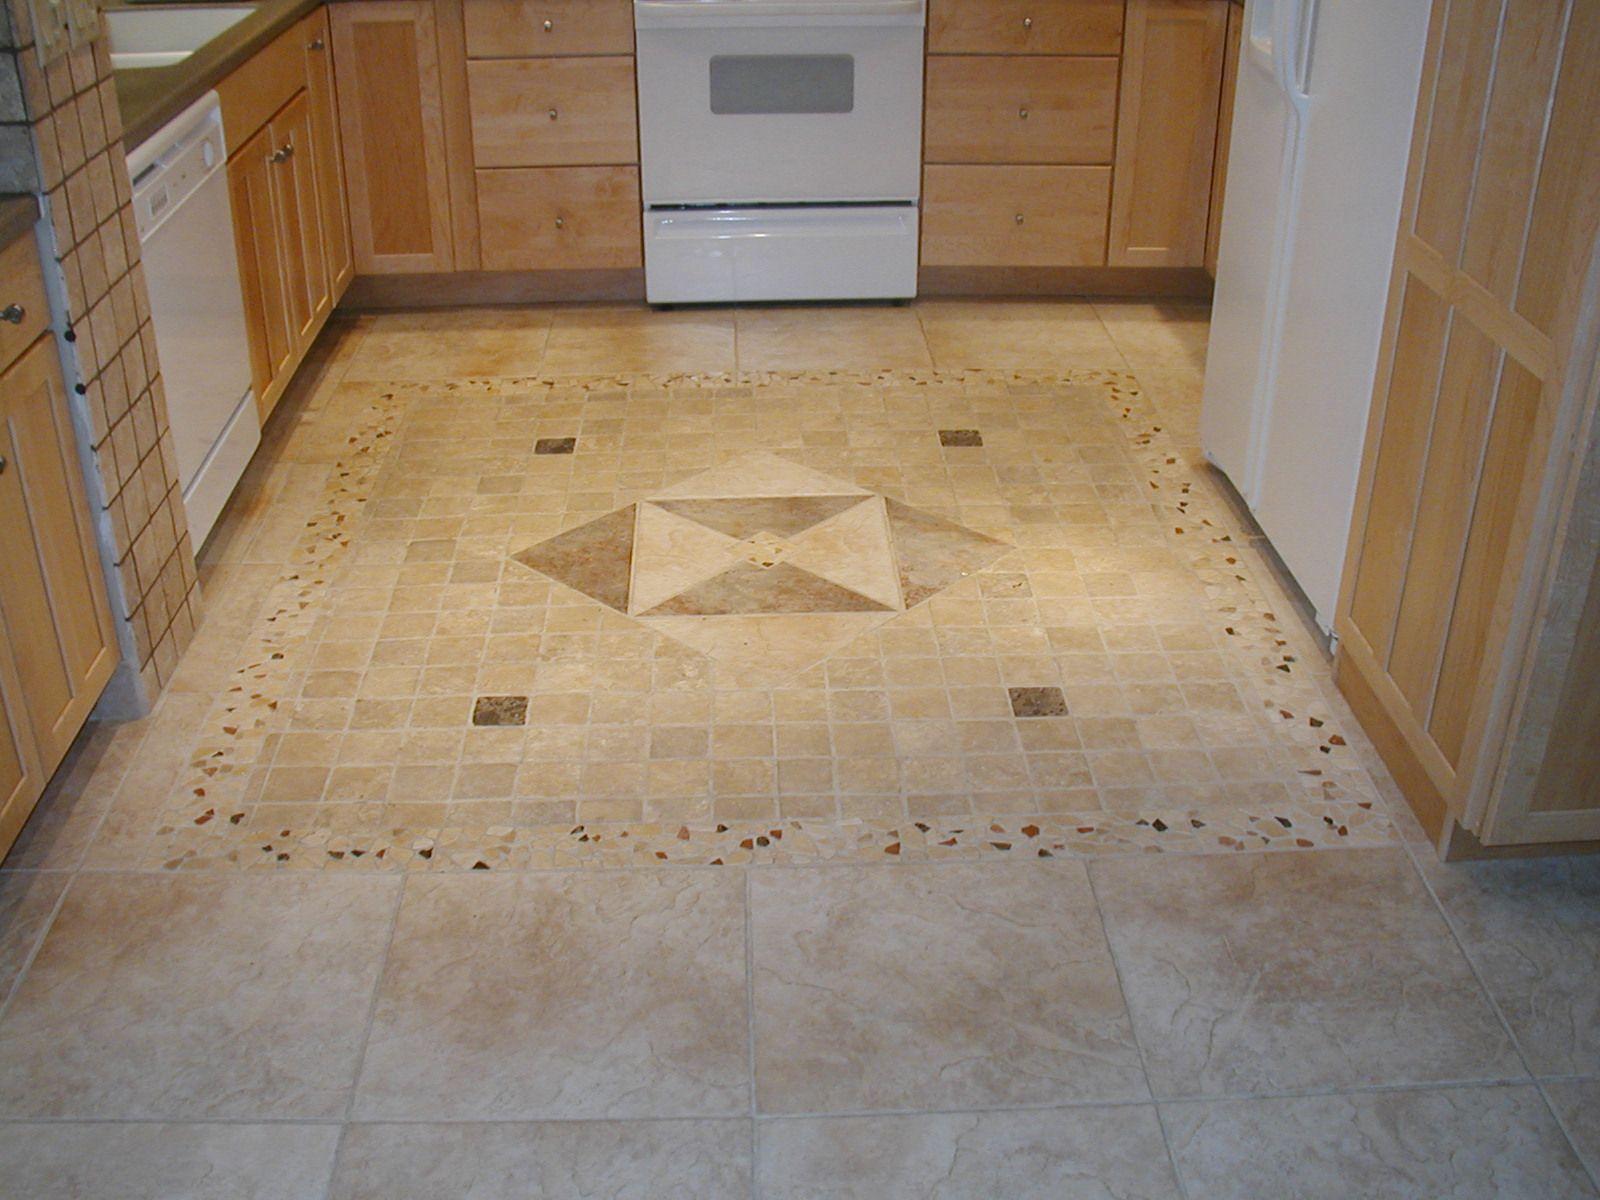 Amazing foyer tile floor designs tile floor designs amazing foyer tile floor designs tile dailygadgetfo Choice Image